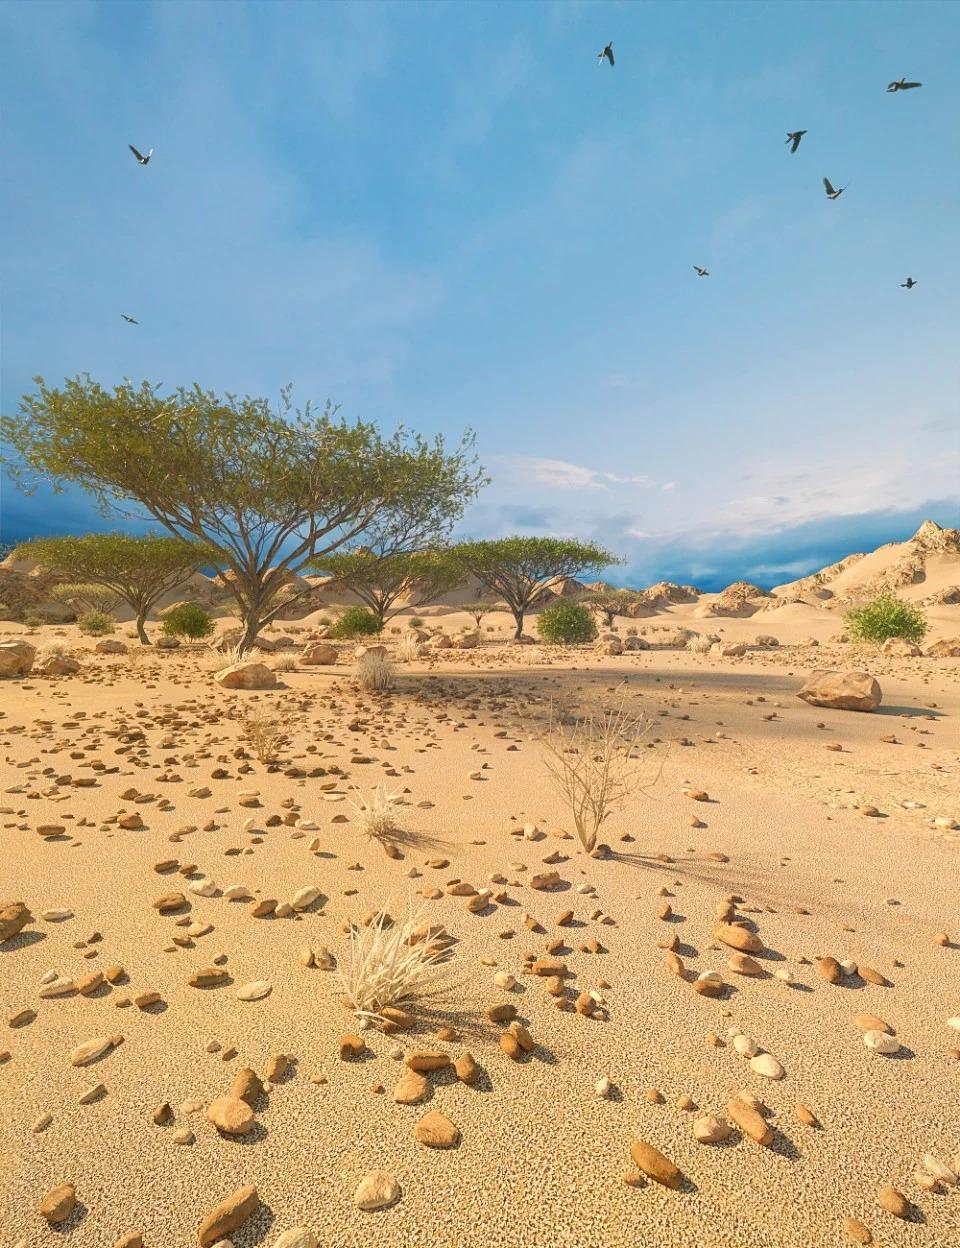 Desert Depression_DAZ3D下载站